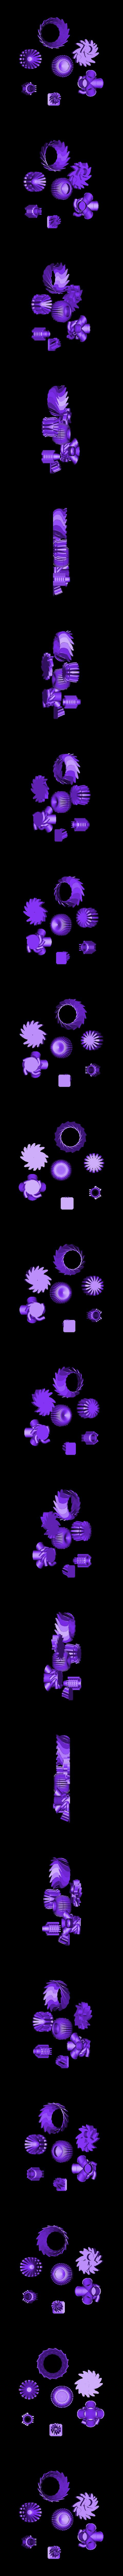 things_1.stl Download free STL file Things • 3D printer model, squiqui